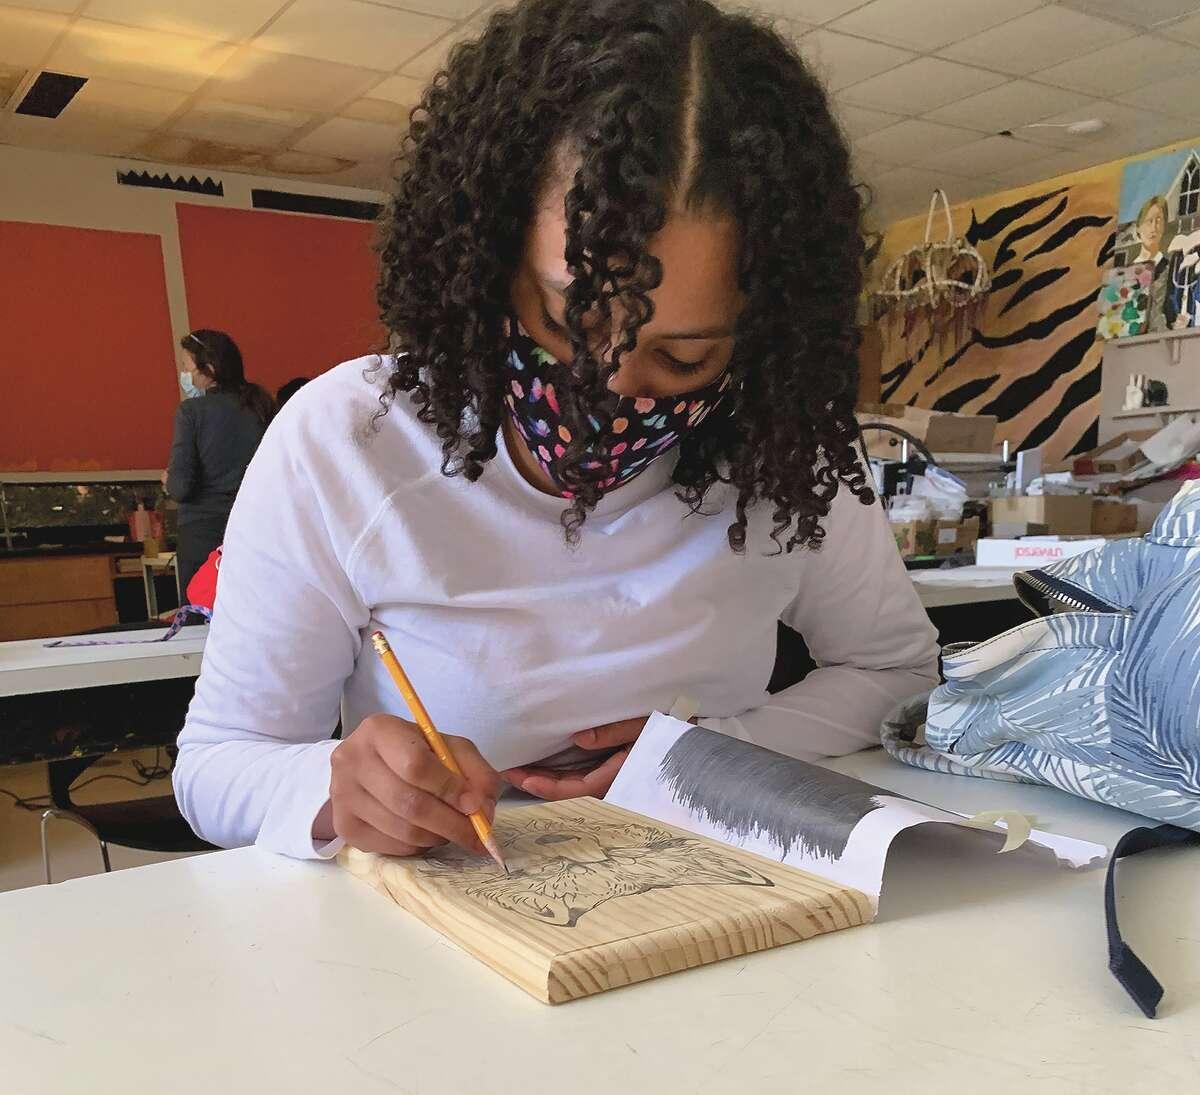 Beardstown High School senior Saivelis Garrido Crispin works on a piece of art during class.